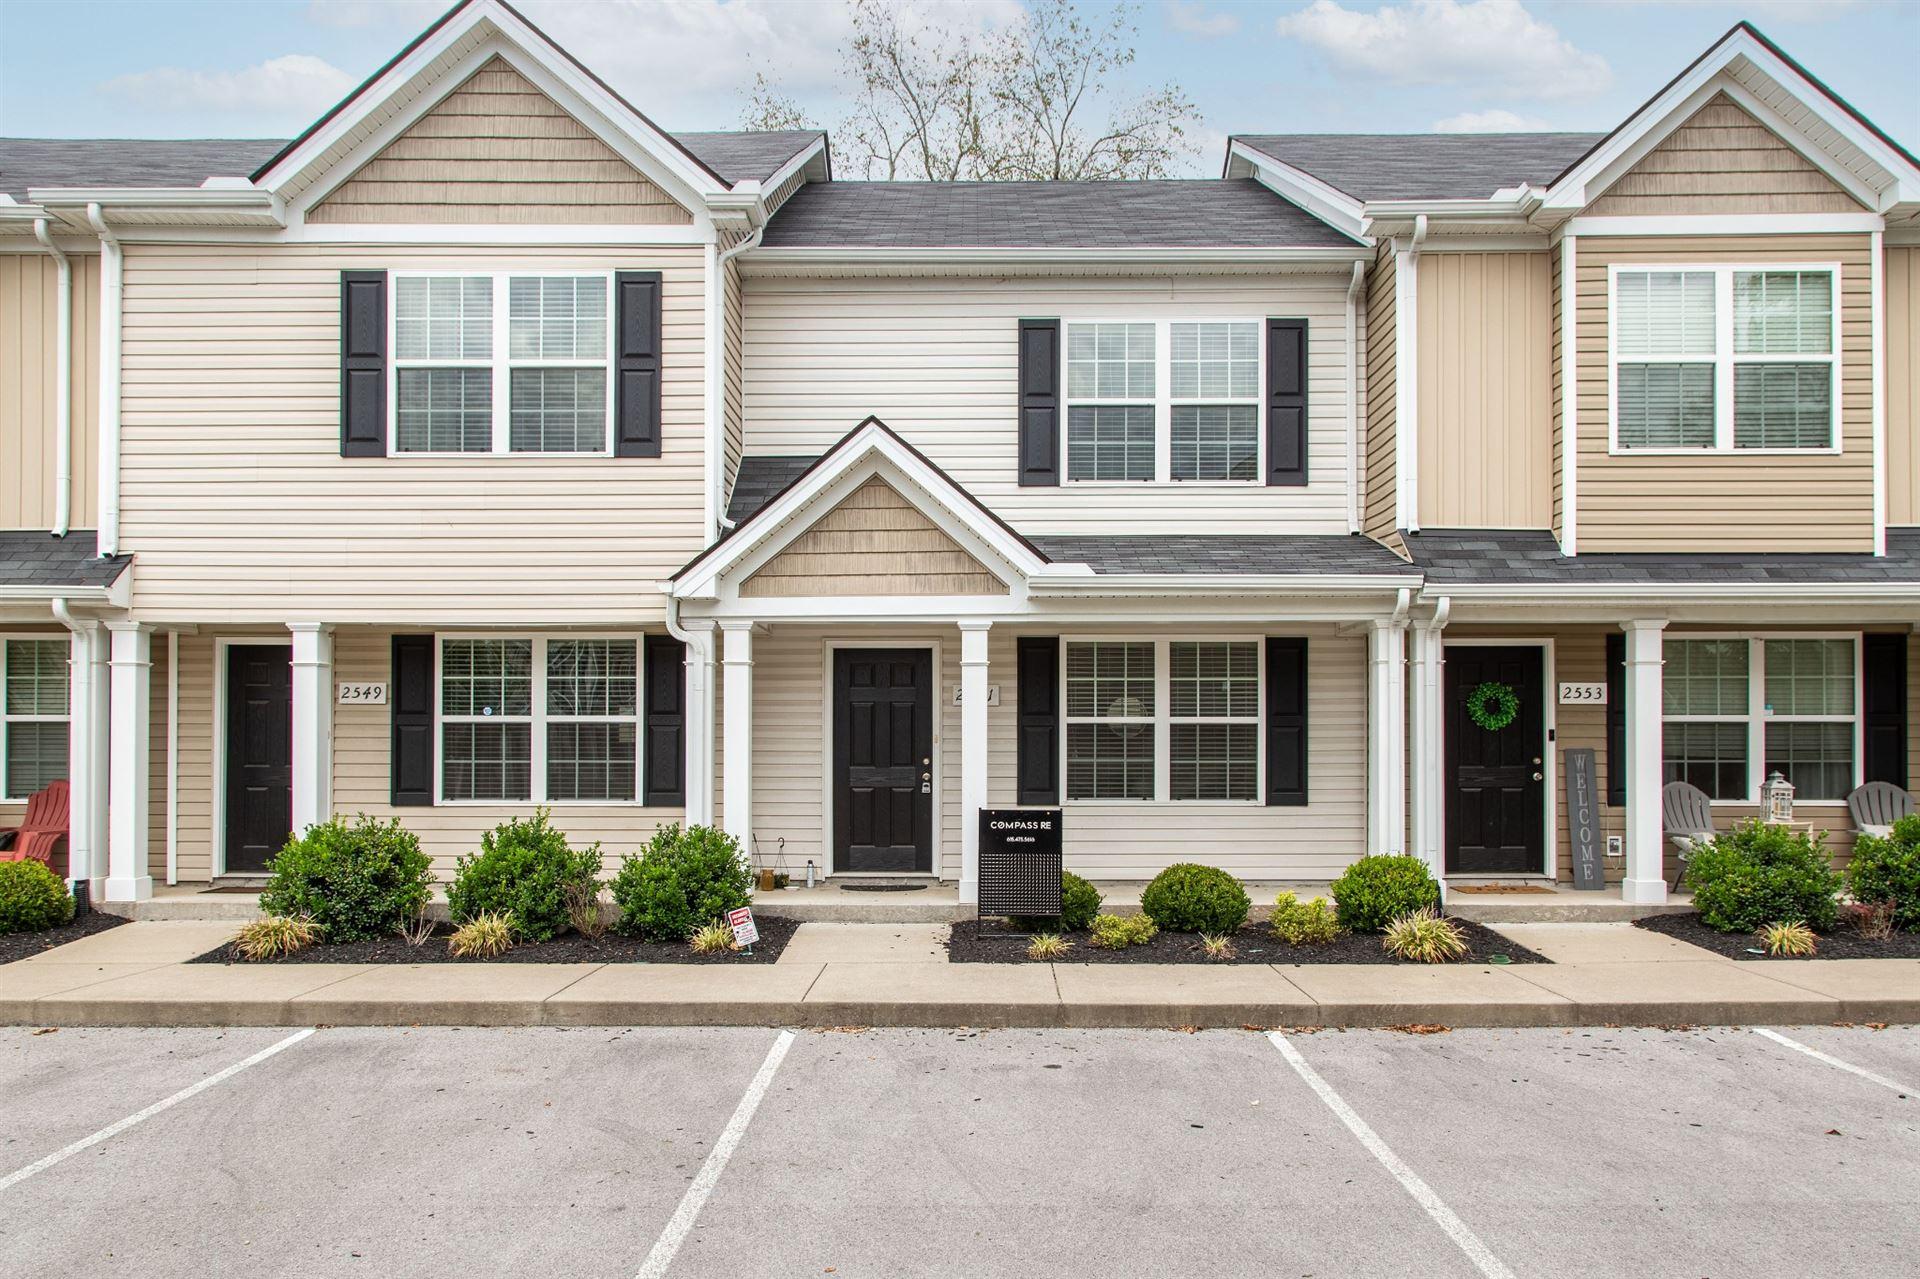 2551 Jackalope St, Murfreesboro, TN 37130 - MLS#: 2291876